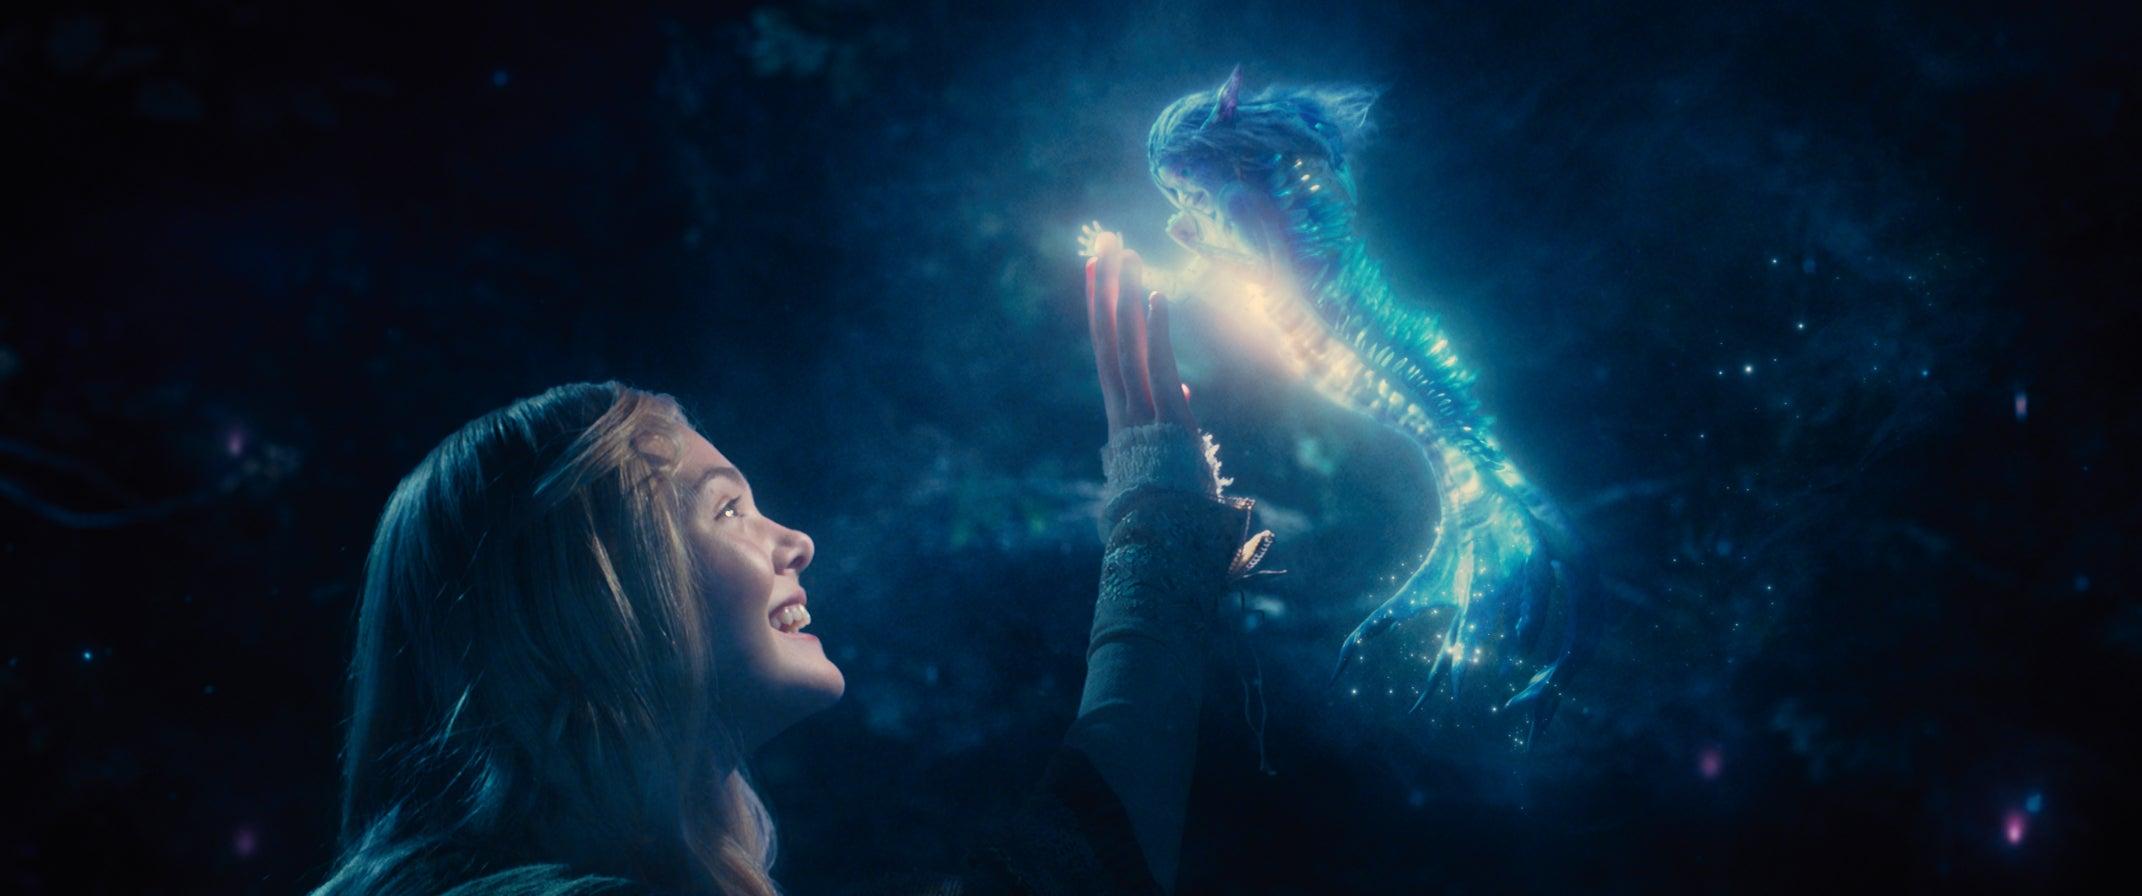 How Disney Built Maleficent's Expansive Fantasy Kingdom